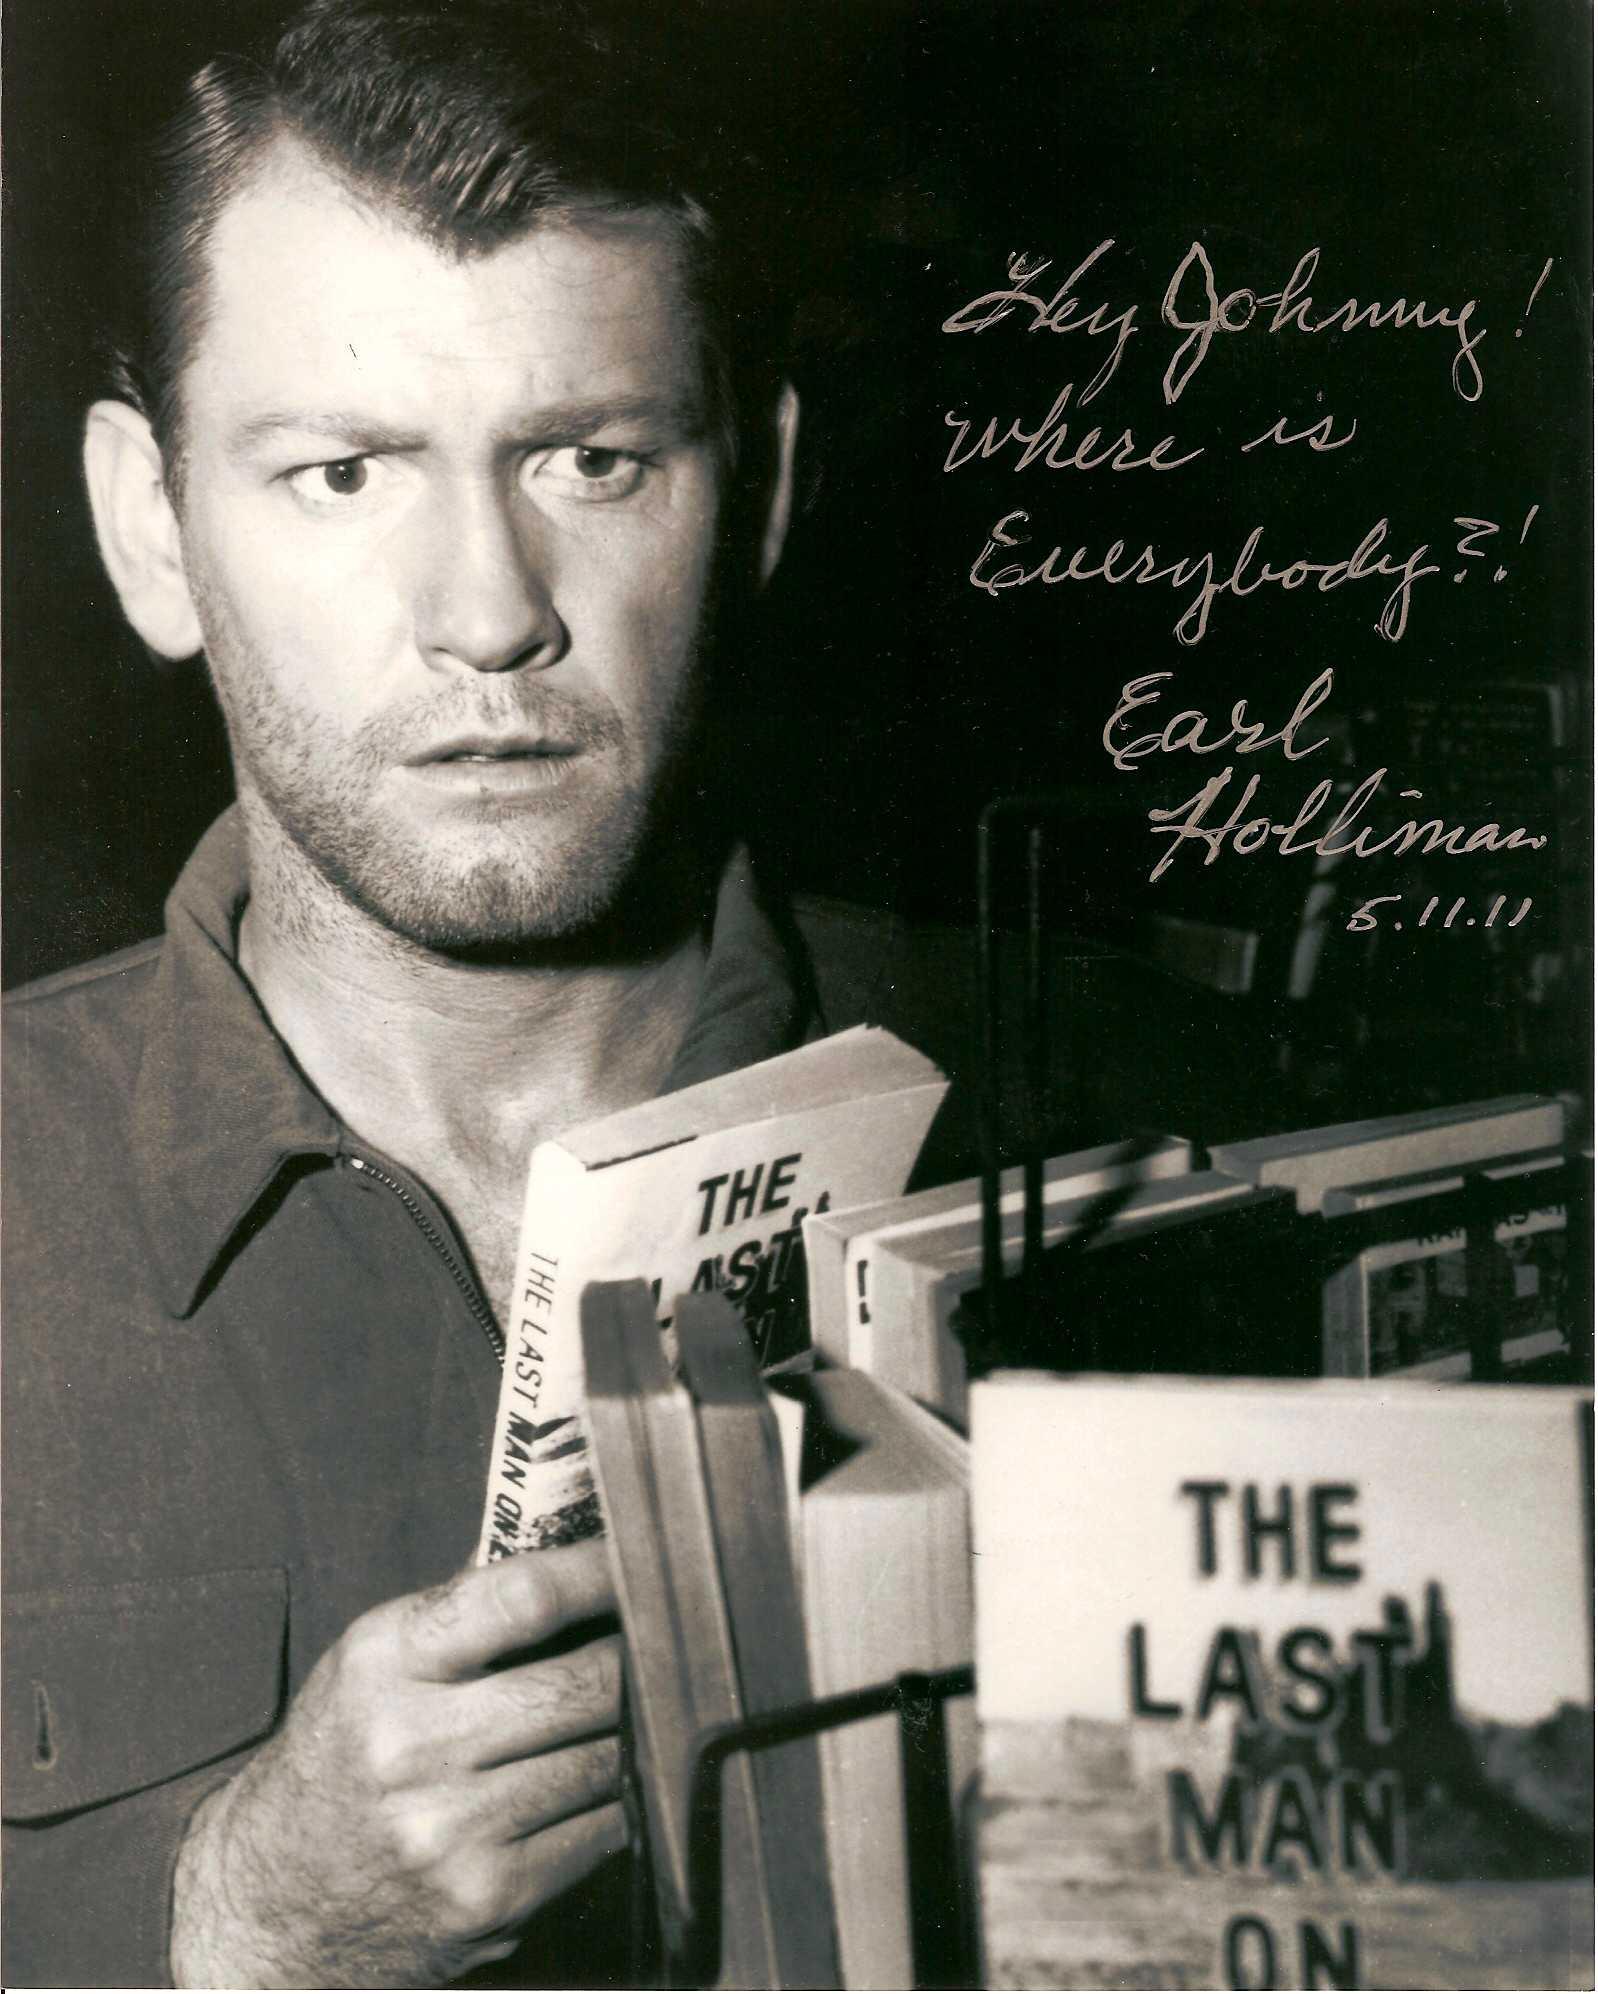 (3) Earl Holliman - The Twilight Zone